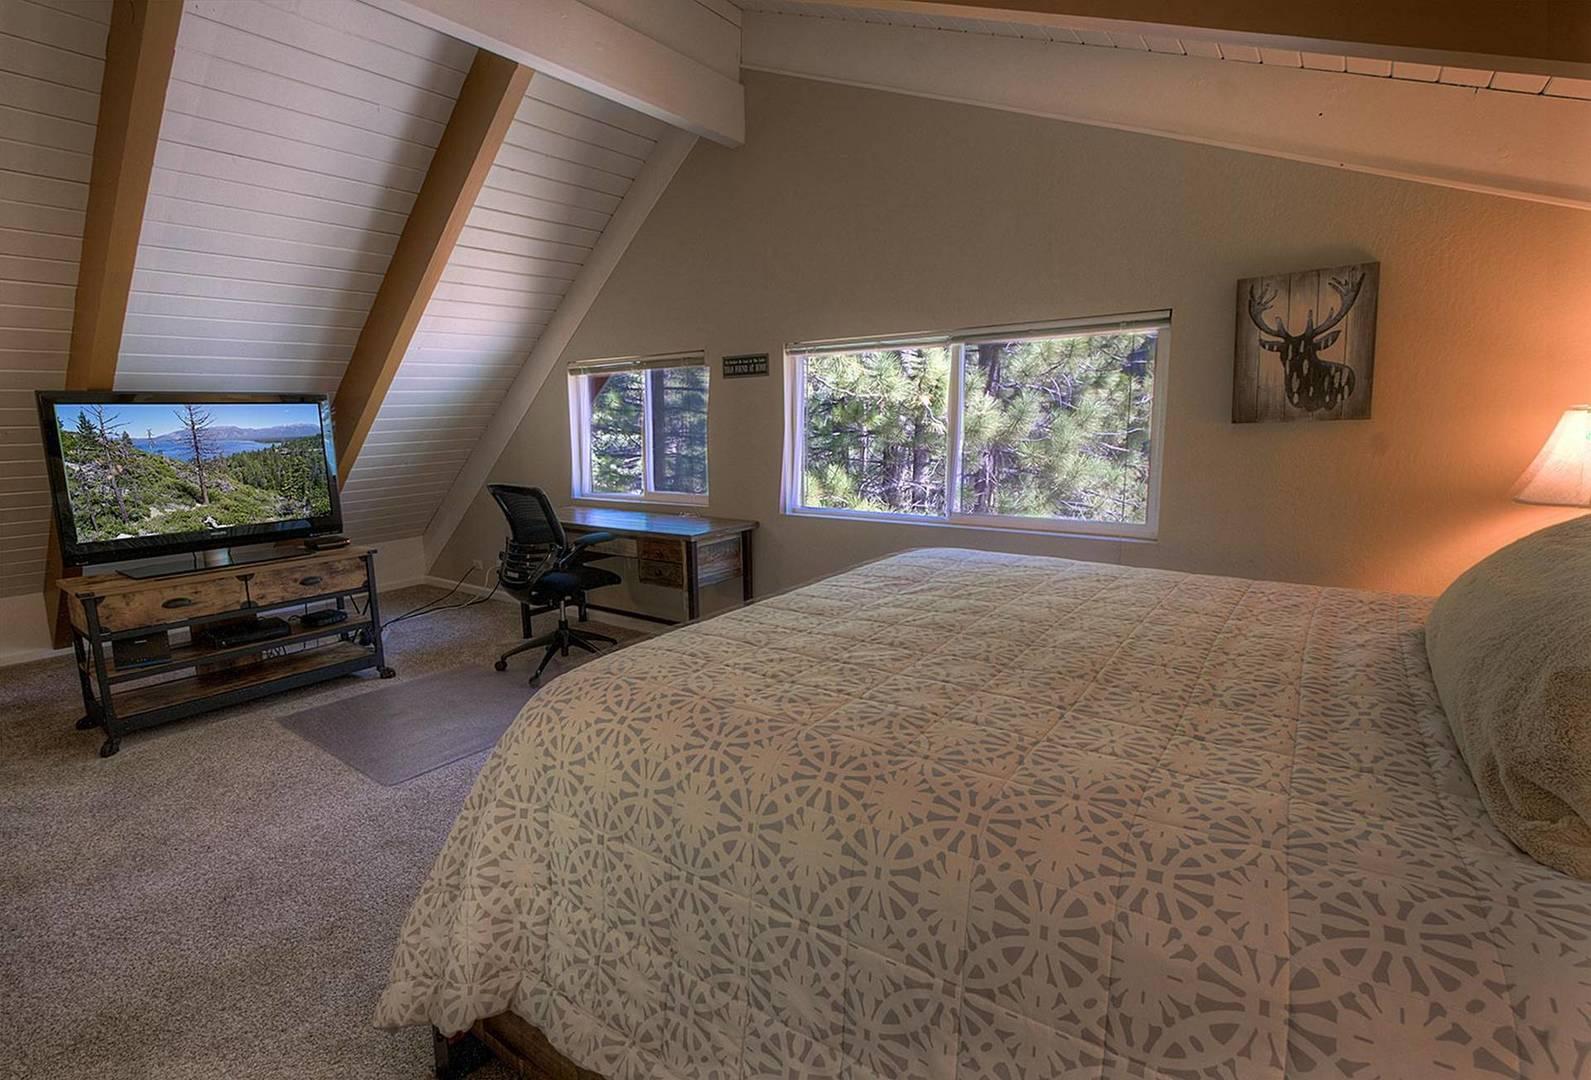 hch0900 bedroom